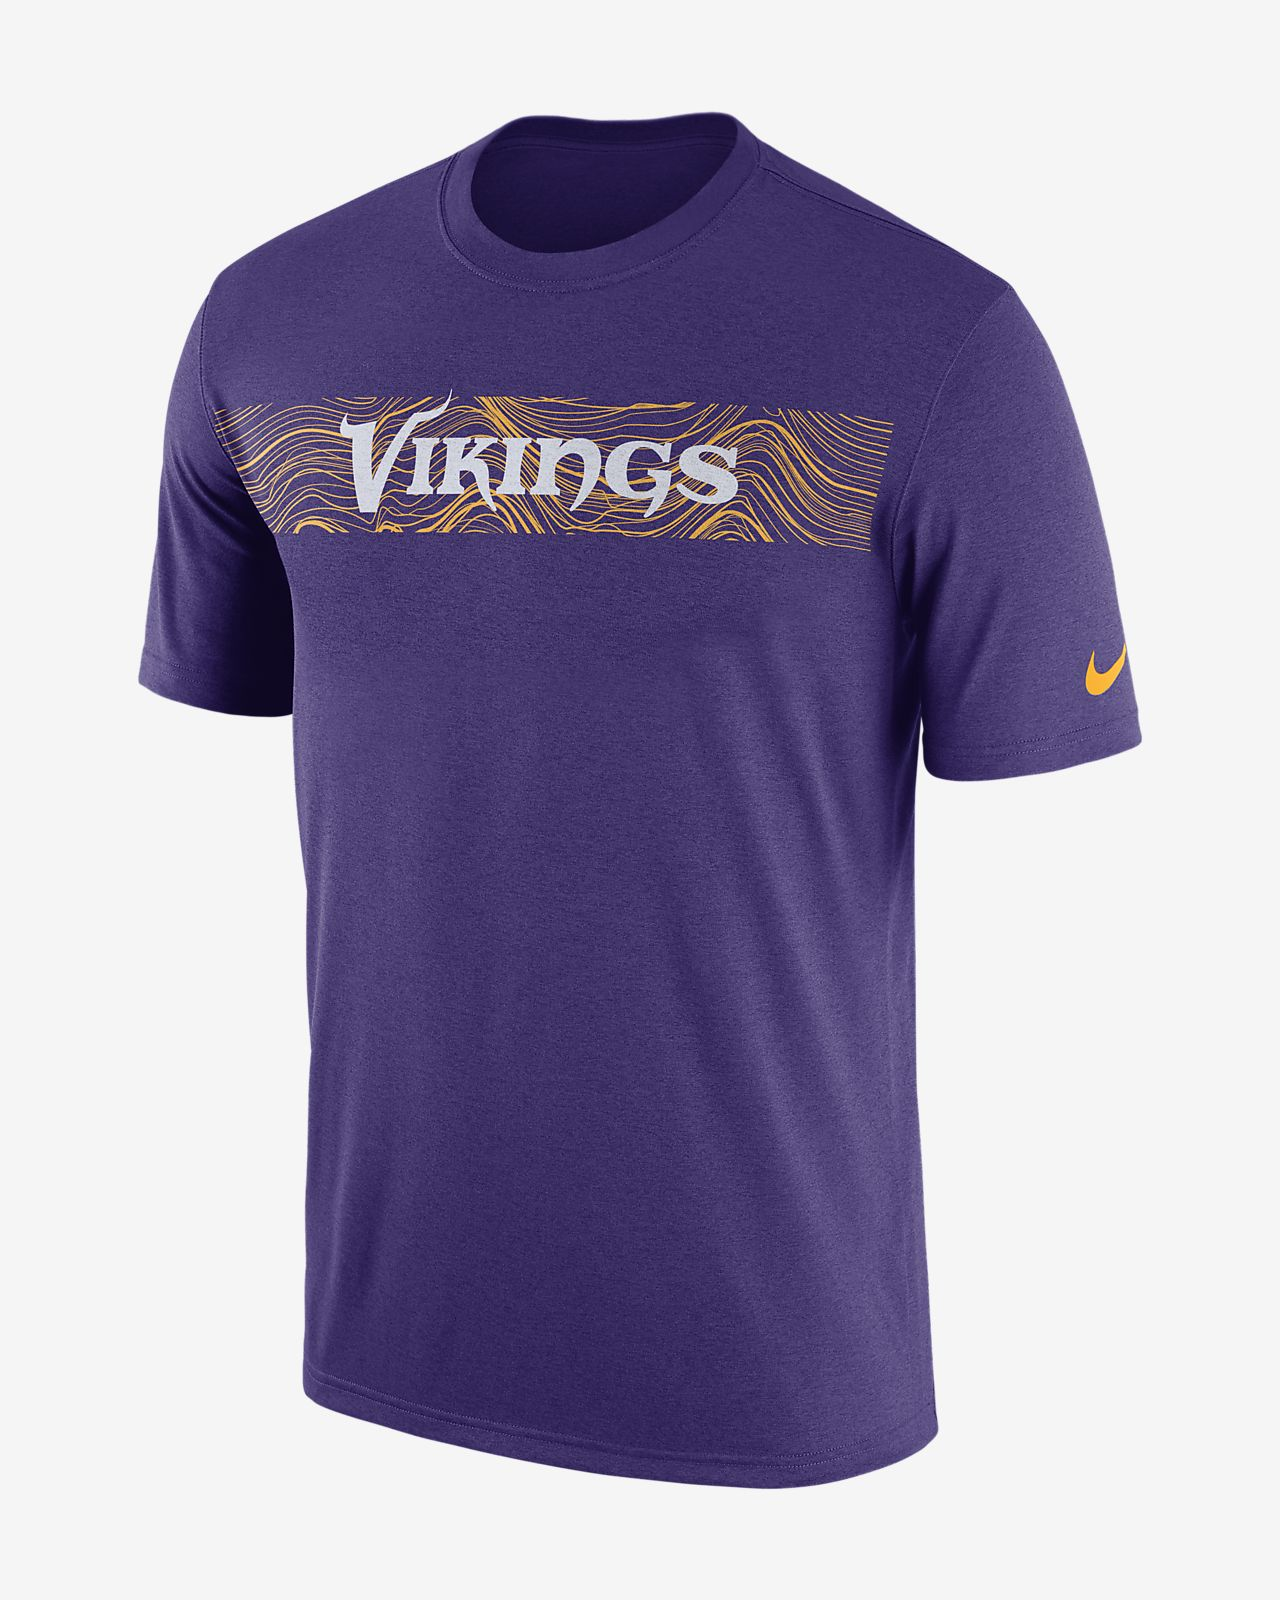 T-shirt Nike Dri-FIT Legend Seismic (NFL Vikings) - Uomo